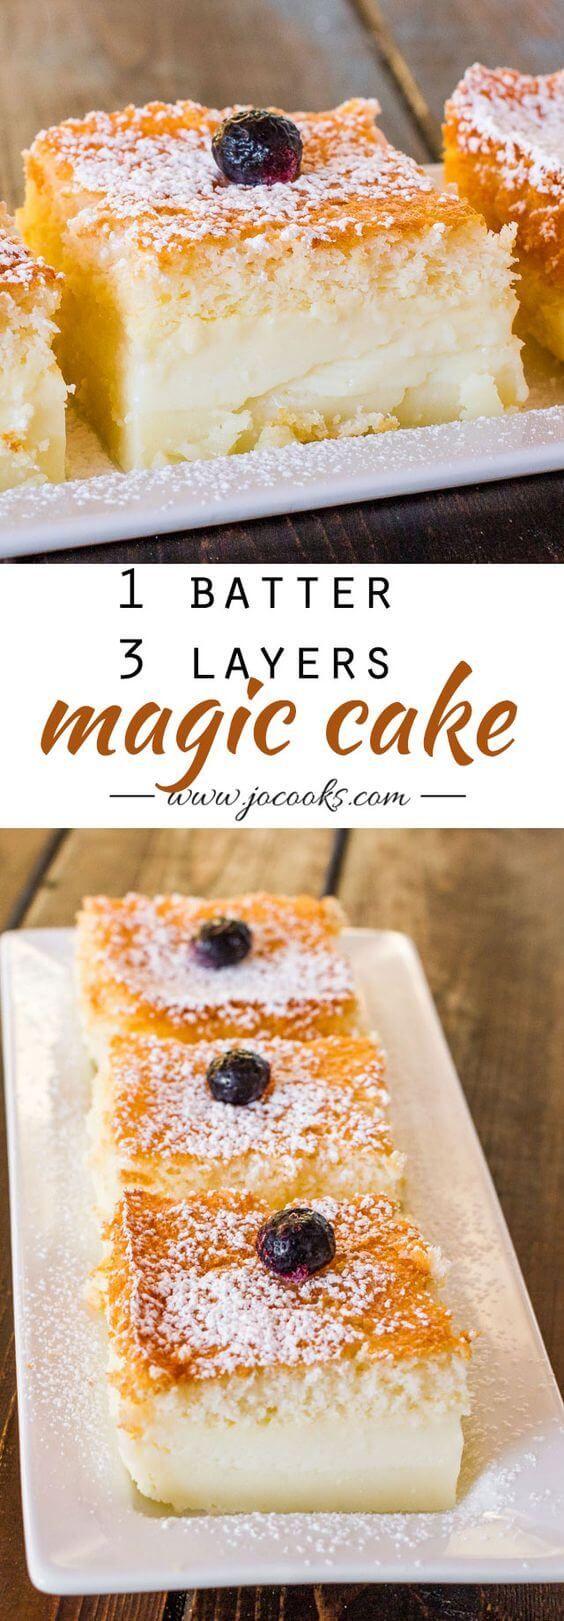 nice Magic Cake